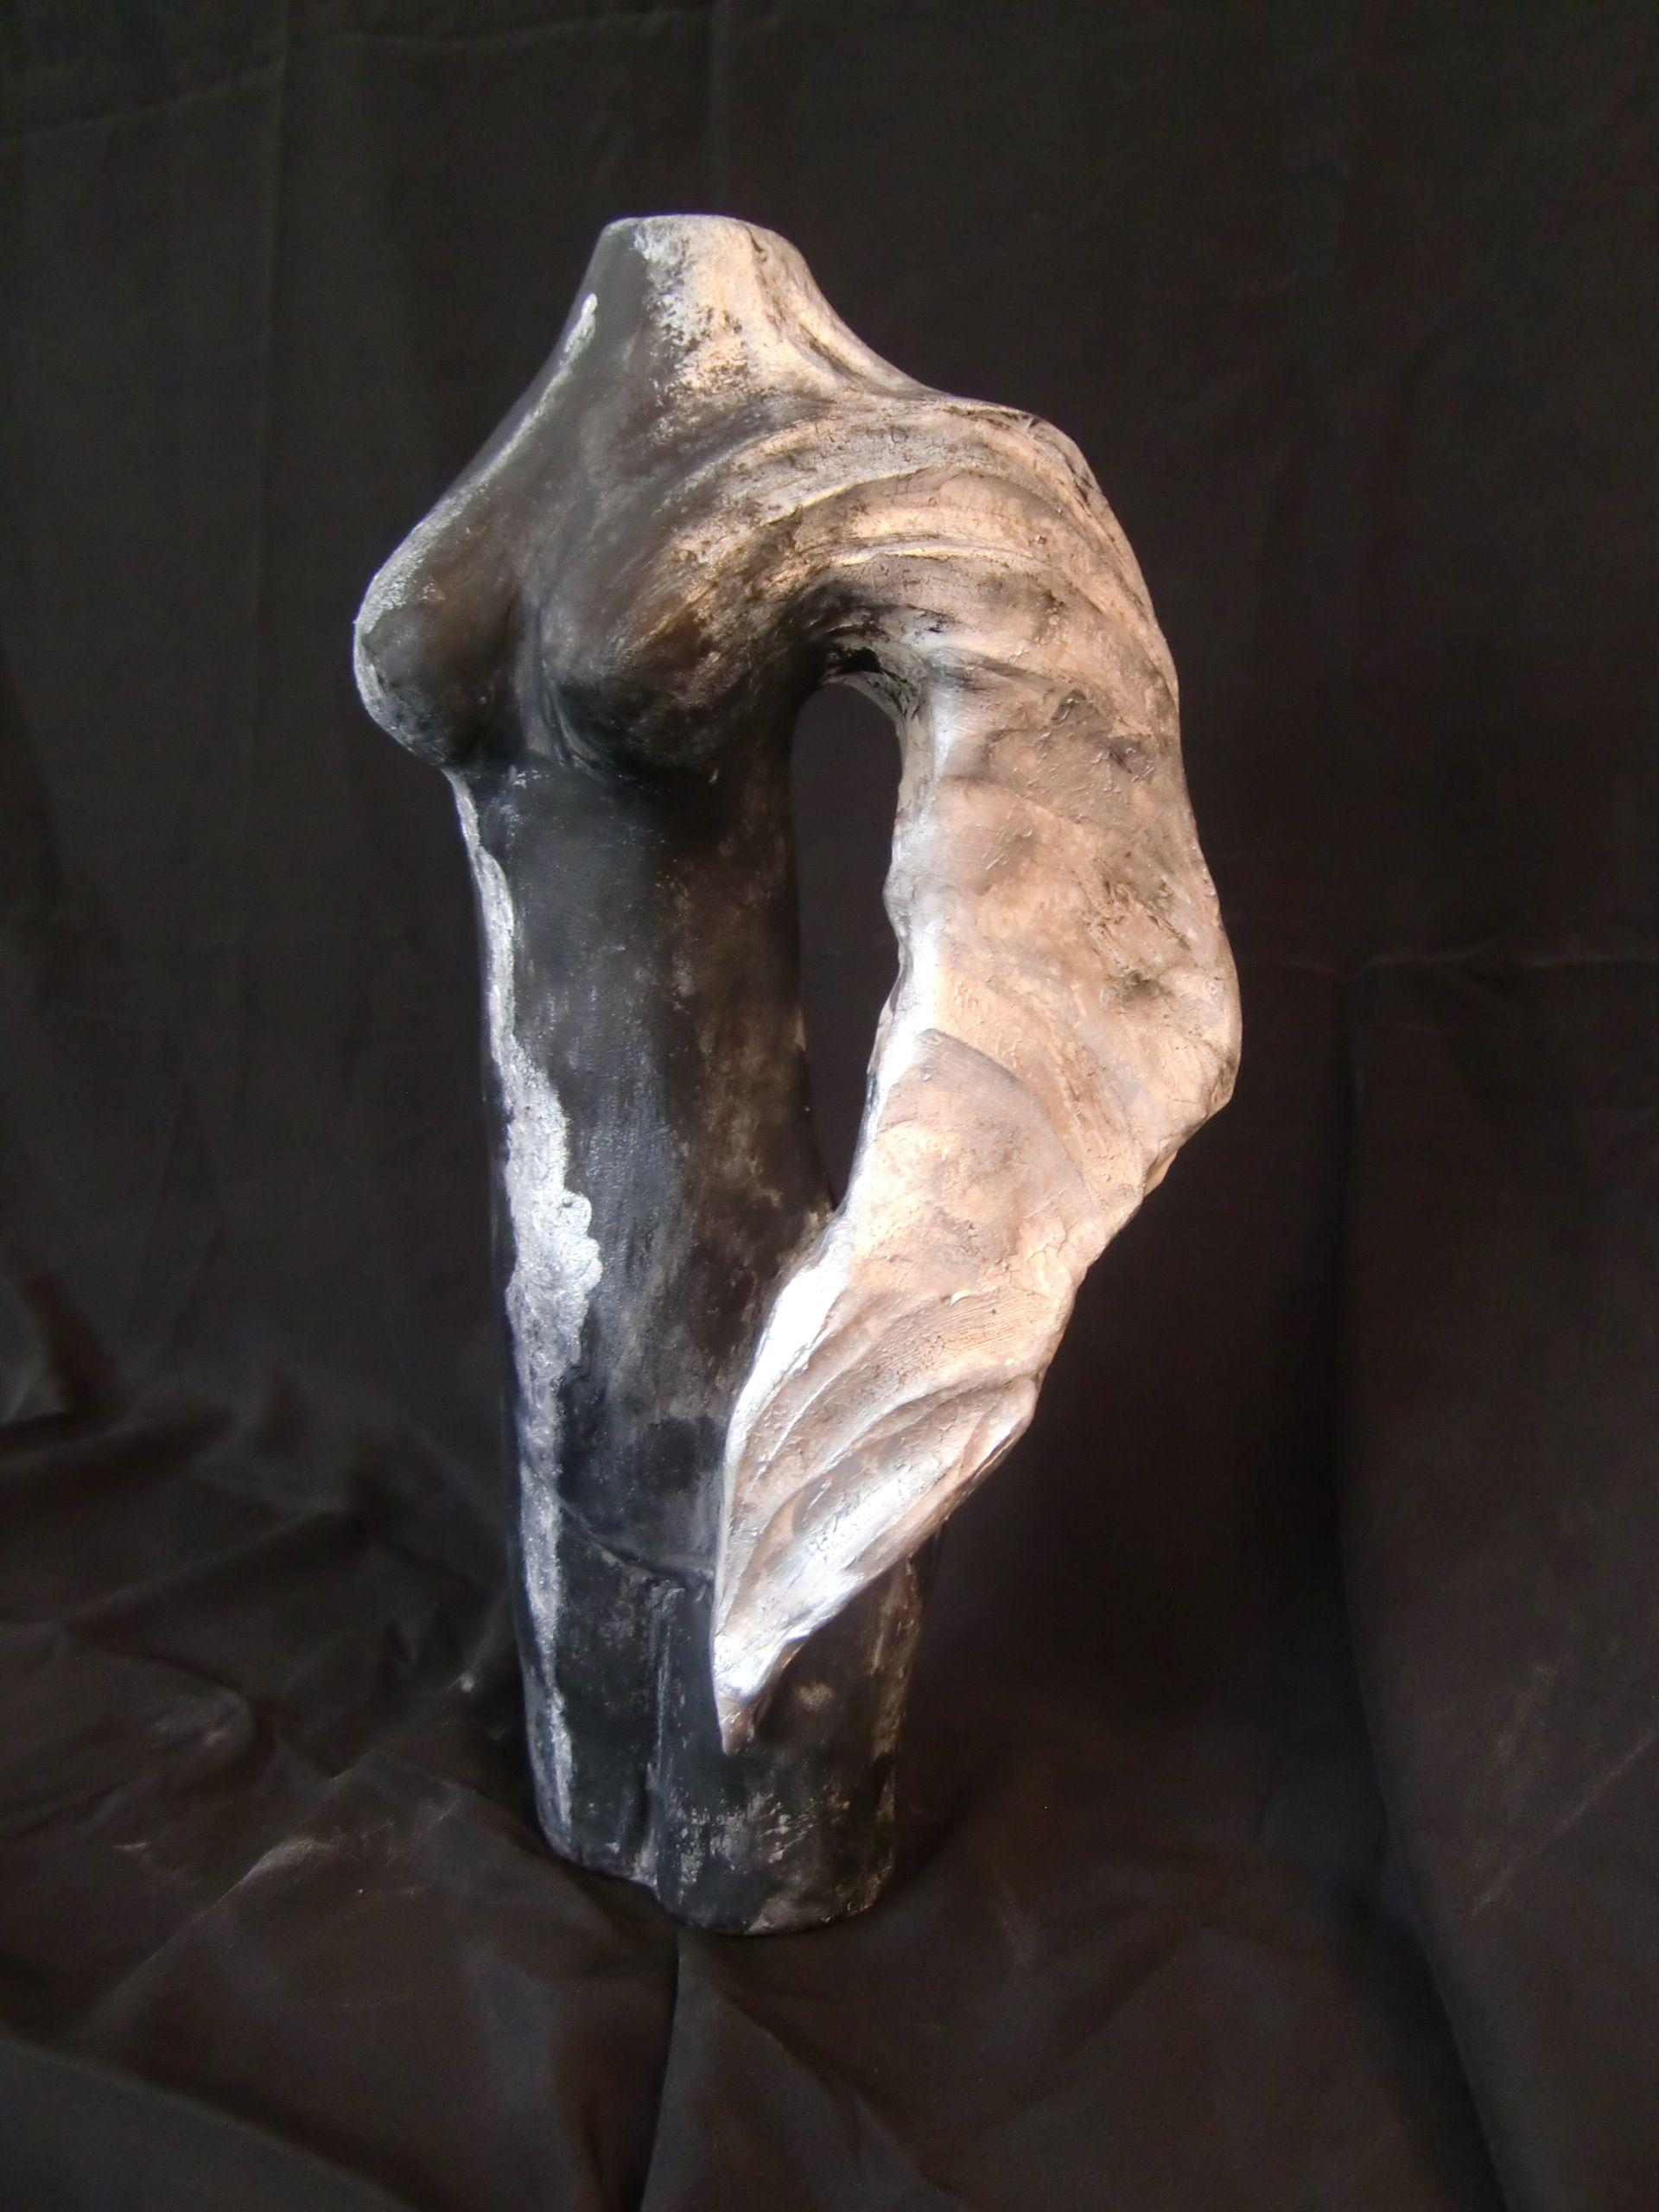 Schutzengel der besonderen Art - bestehend aus Ton -  weitere Skulpturen unter www.skulptur4u.de